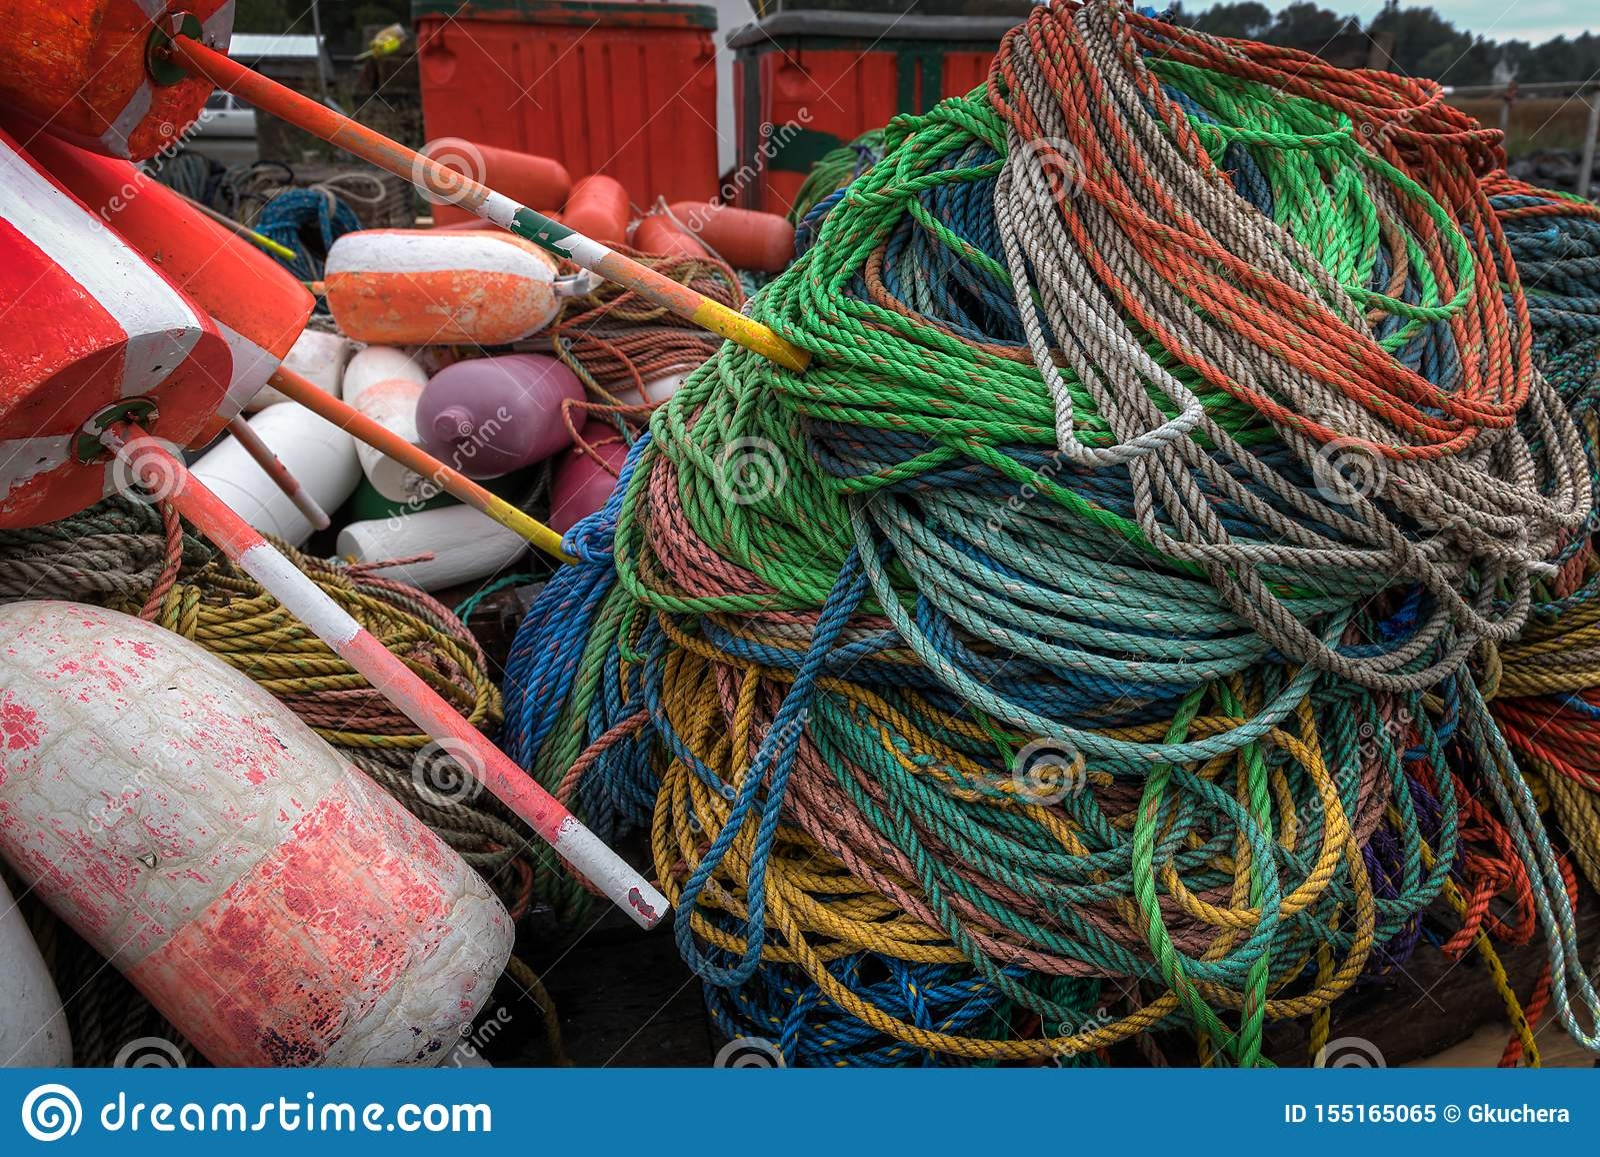 Ropes and Buoys Close Up